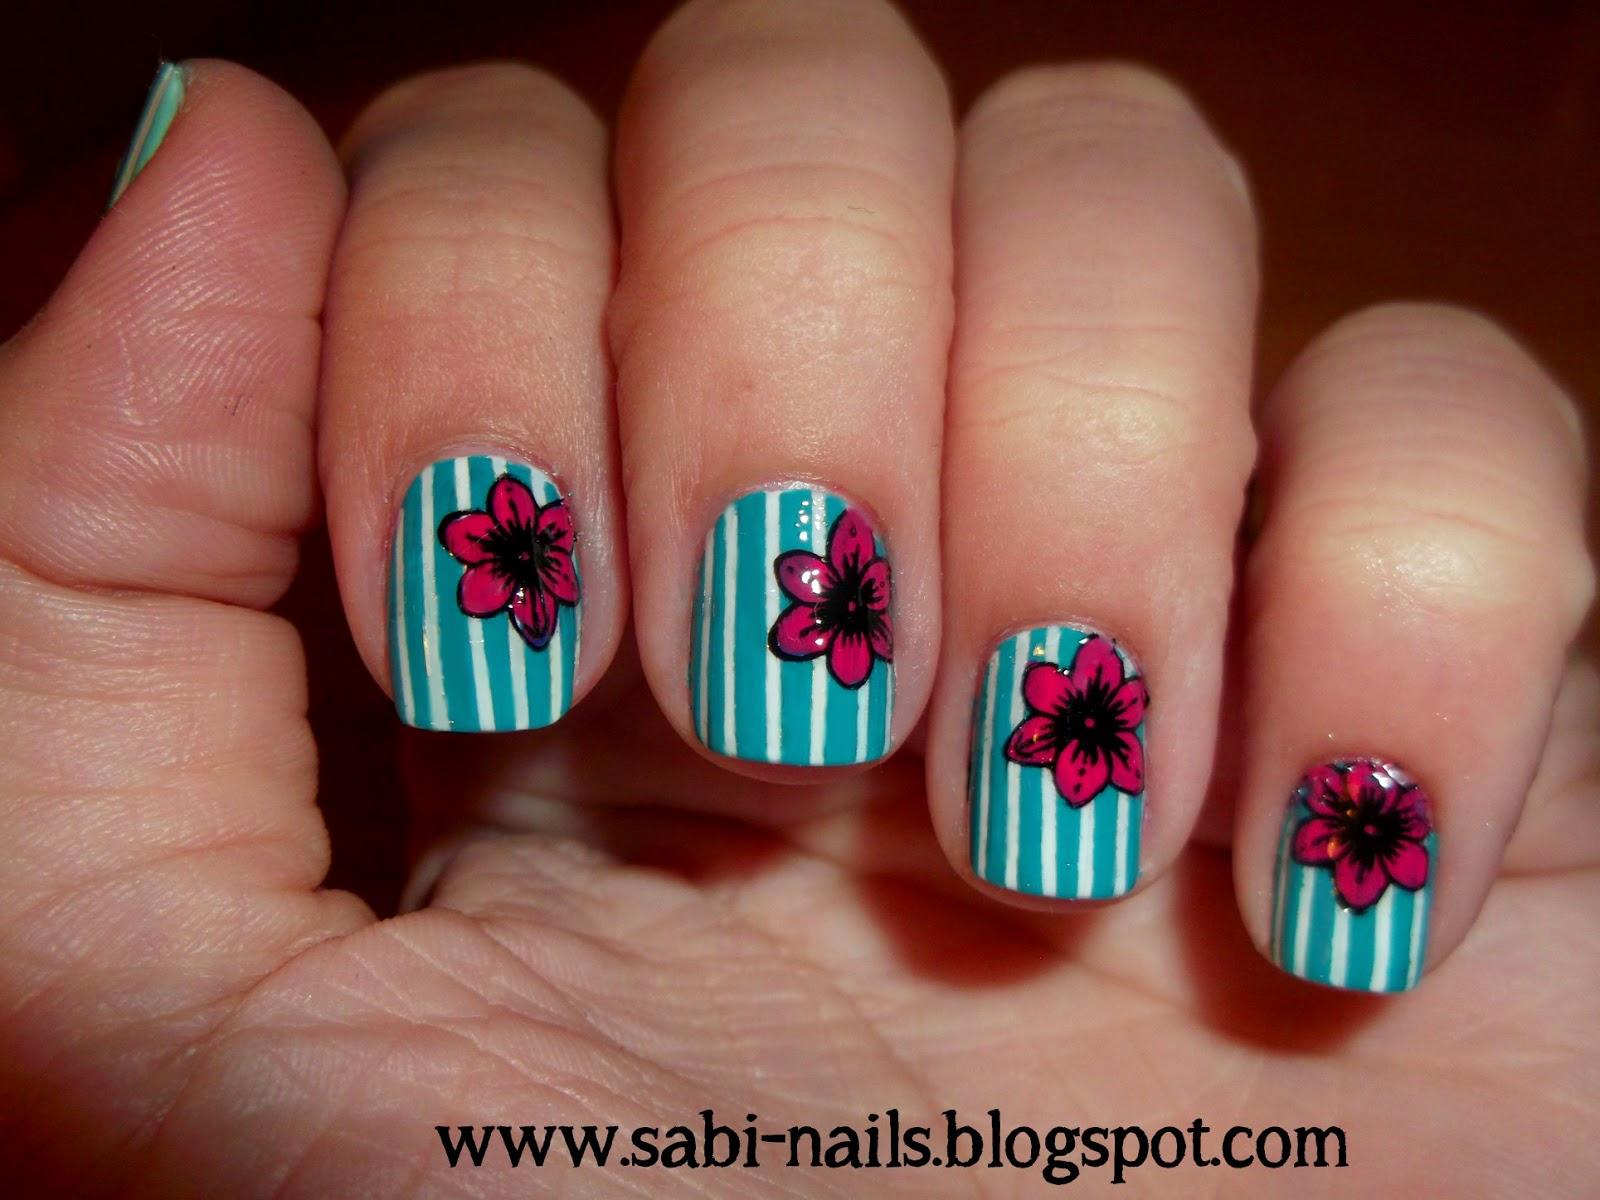 http://sabi-nails.blogspot.com/2014/04/kwiatki-na-paskach.html